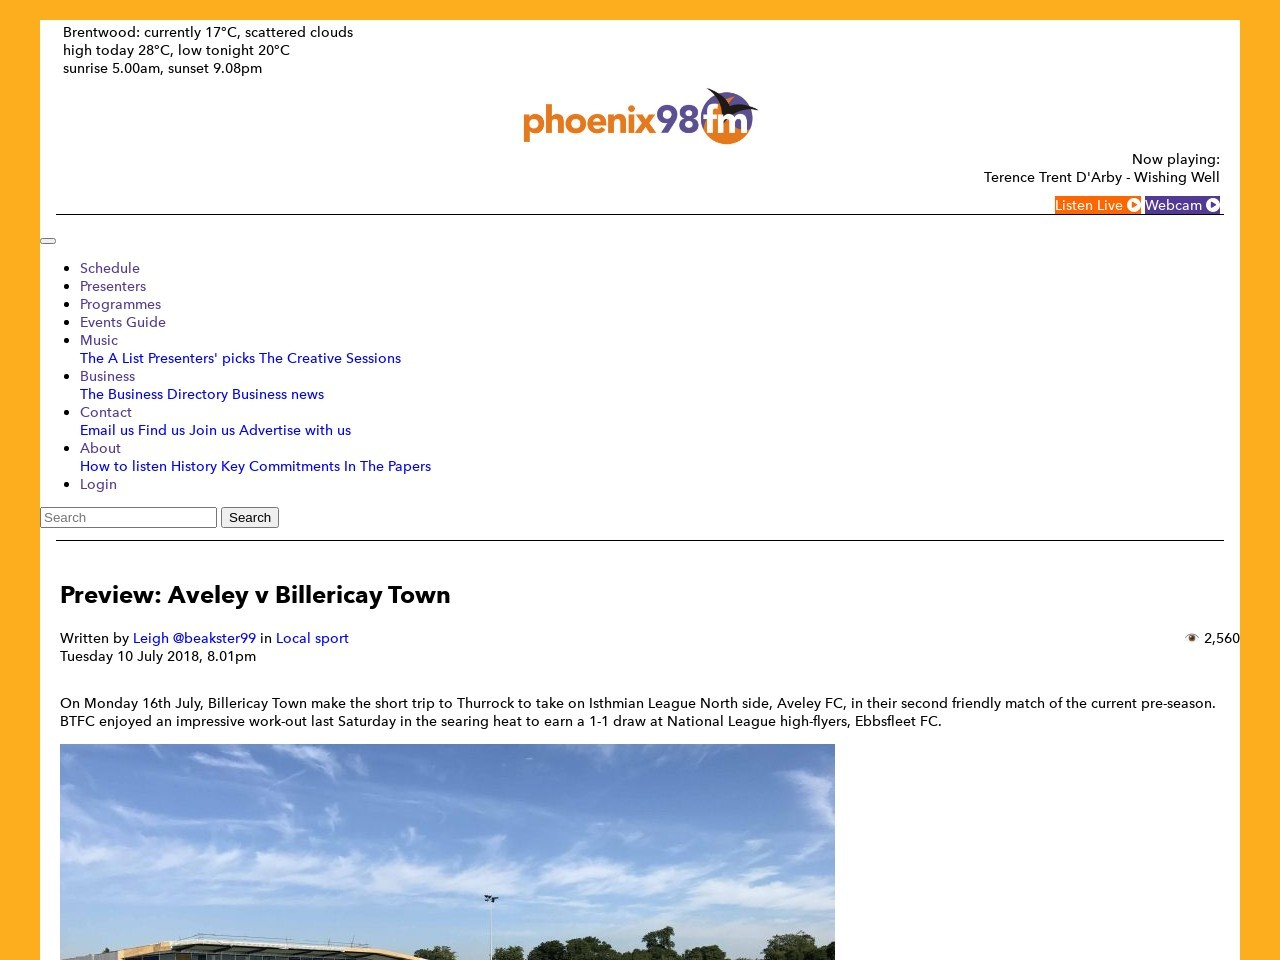 Preview: Aveley v Billericay Town